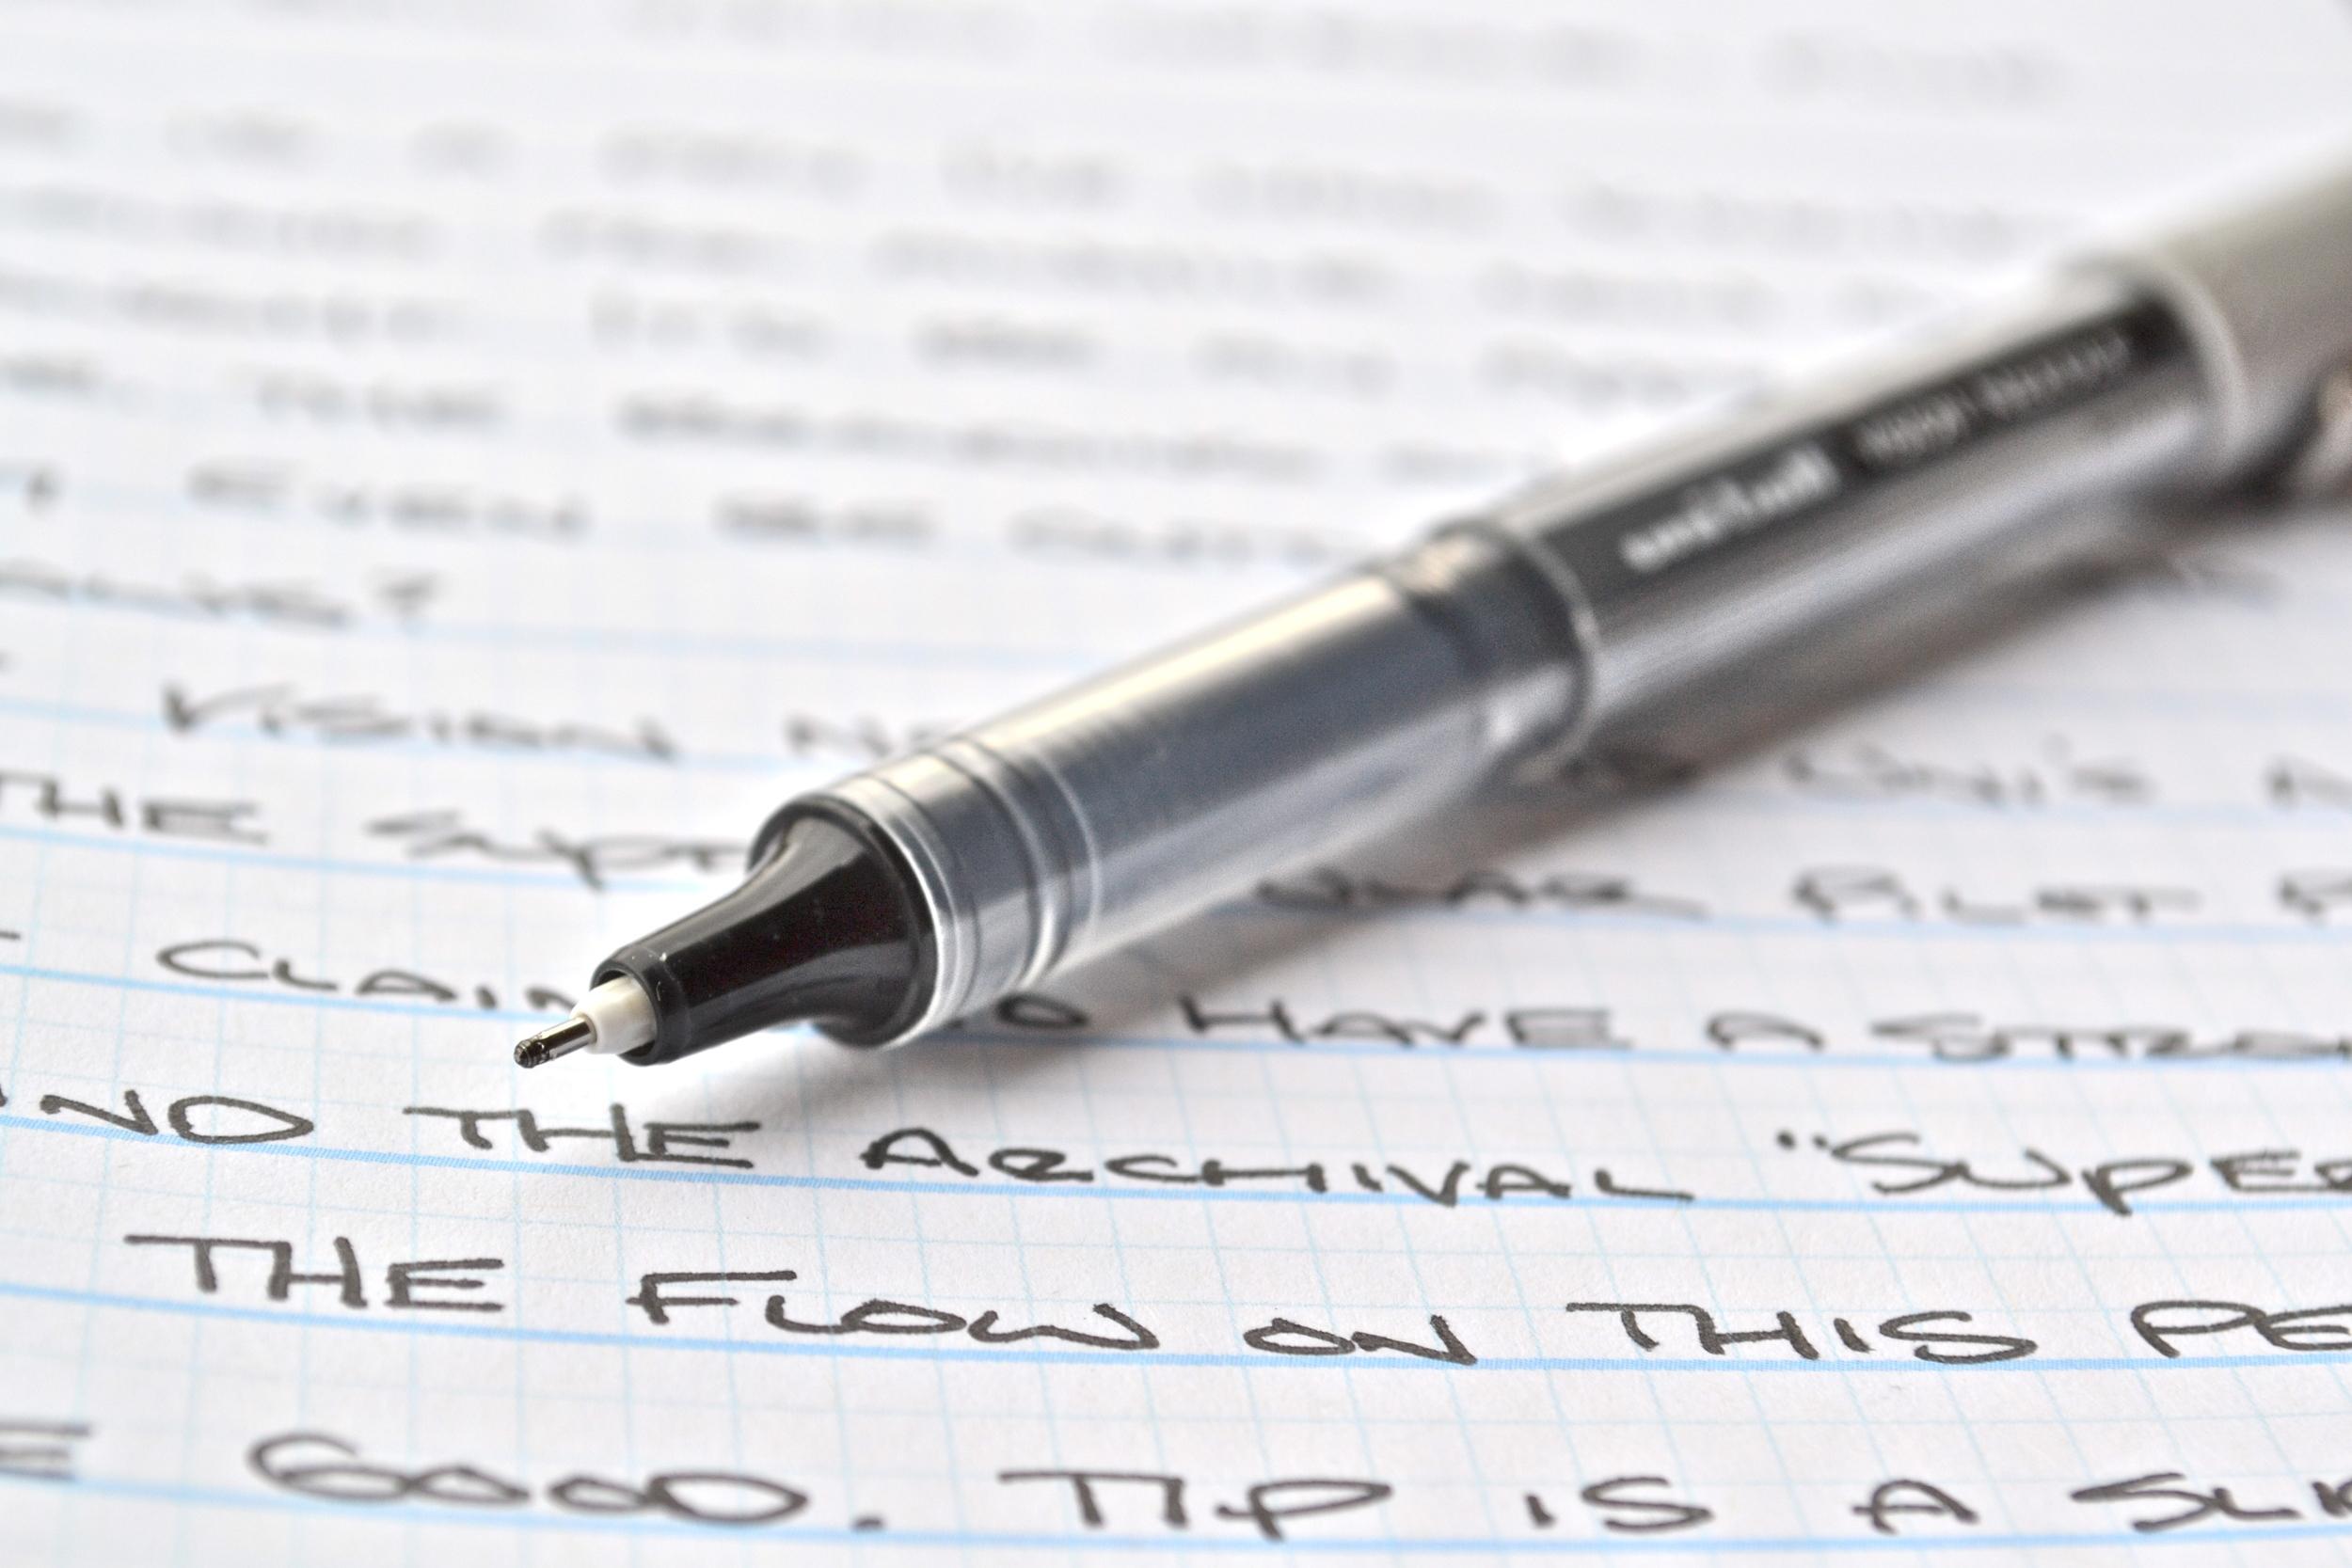 Uni-ball Vision Needle Pen Review